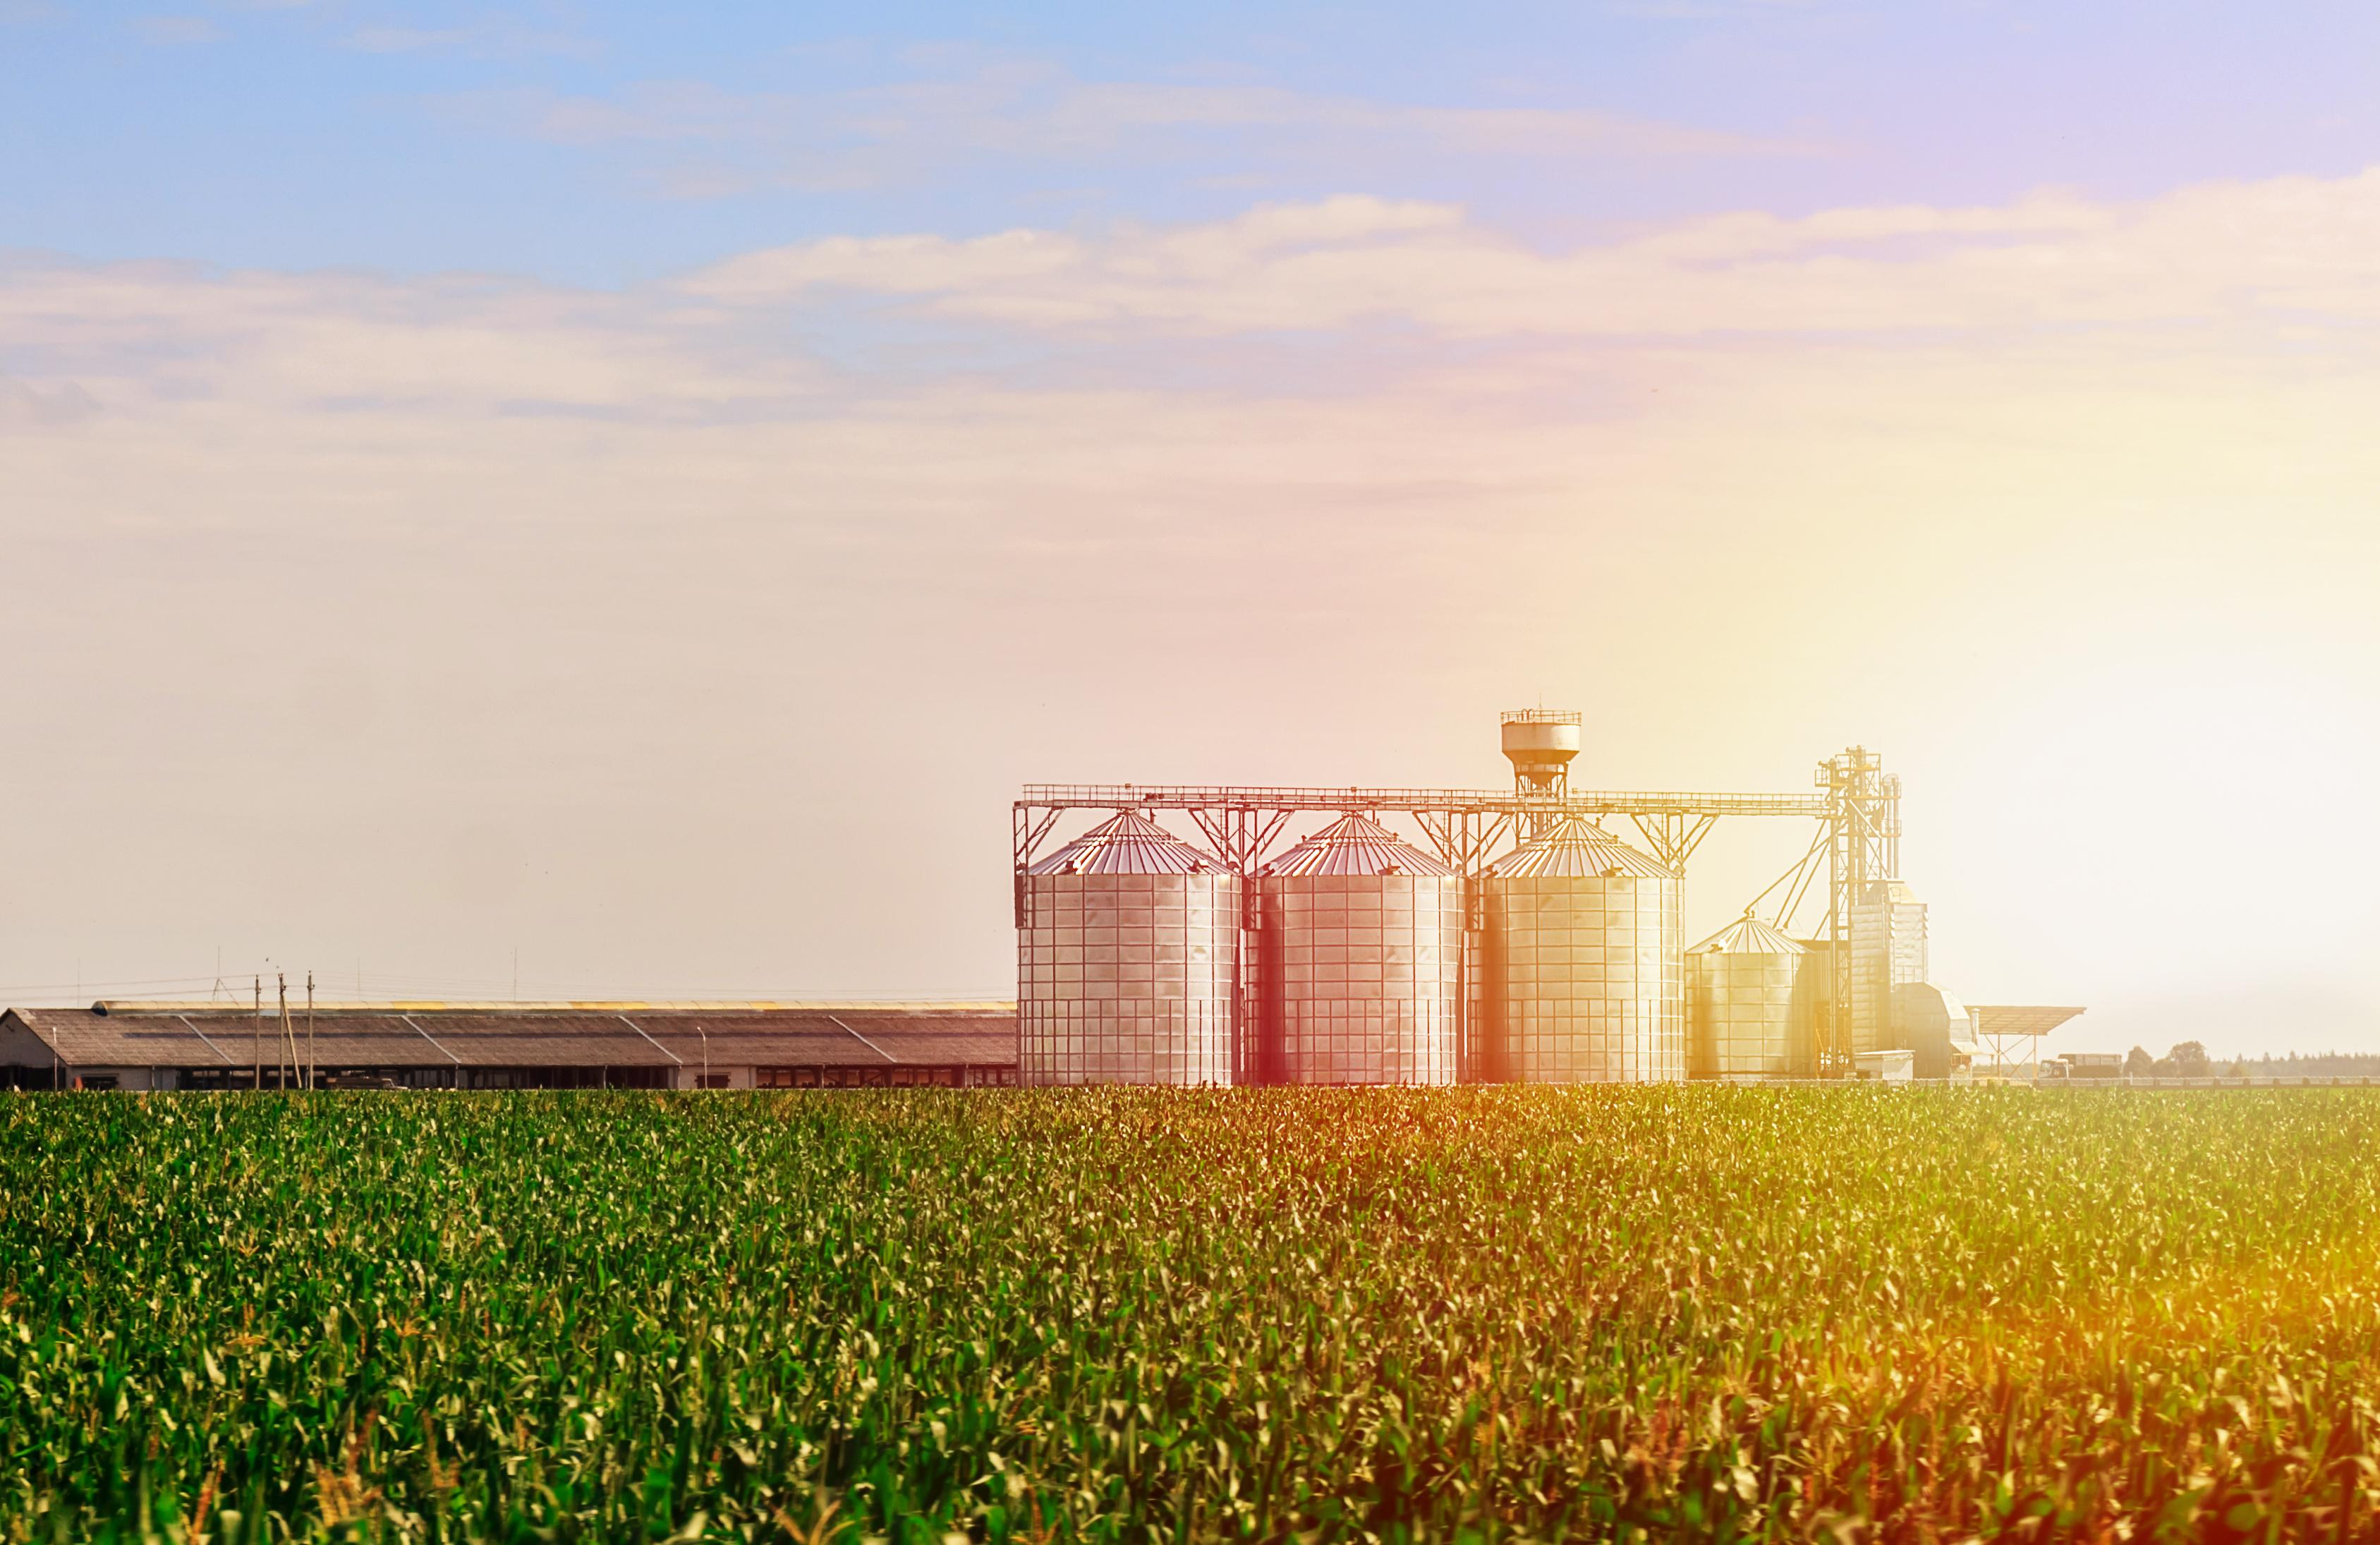 Grain silos in rural environment